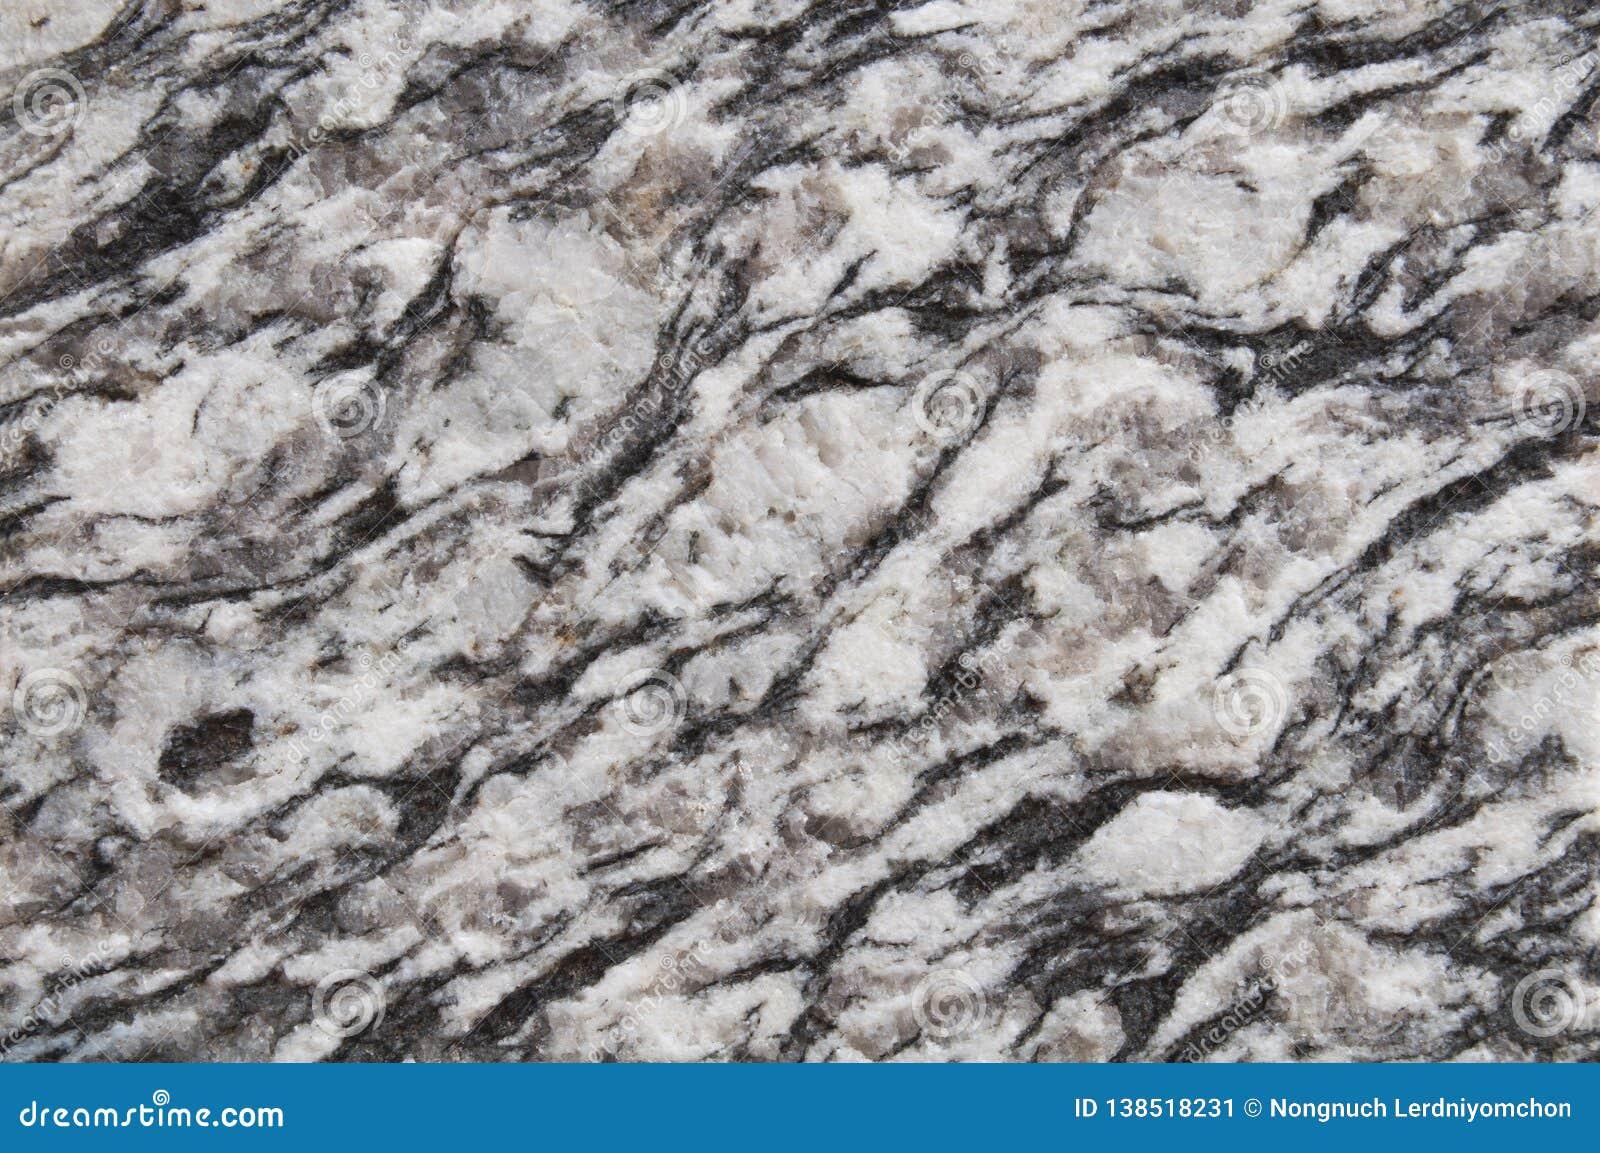 Black and white,dark brown granite stone texture background.wall,floor black granite,quartz stone natural pattern design or abstra